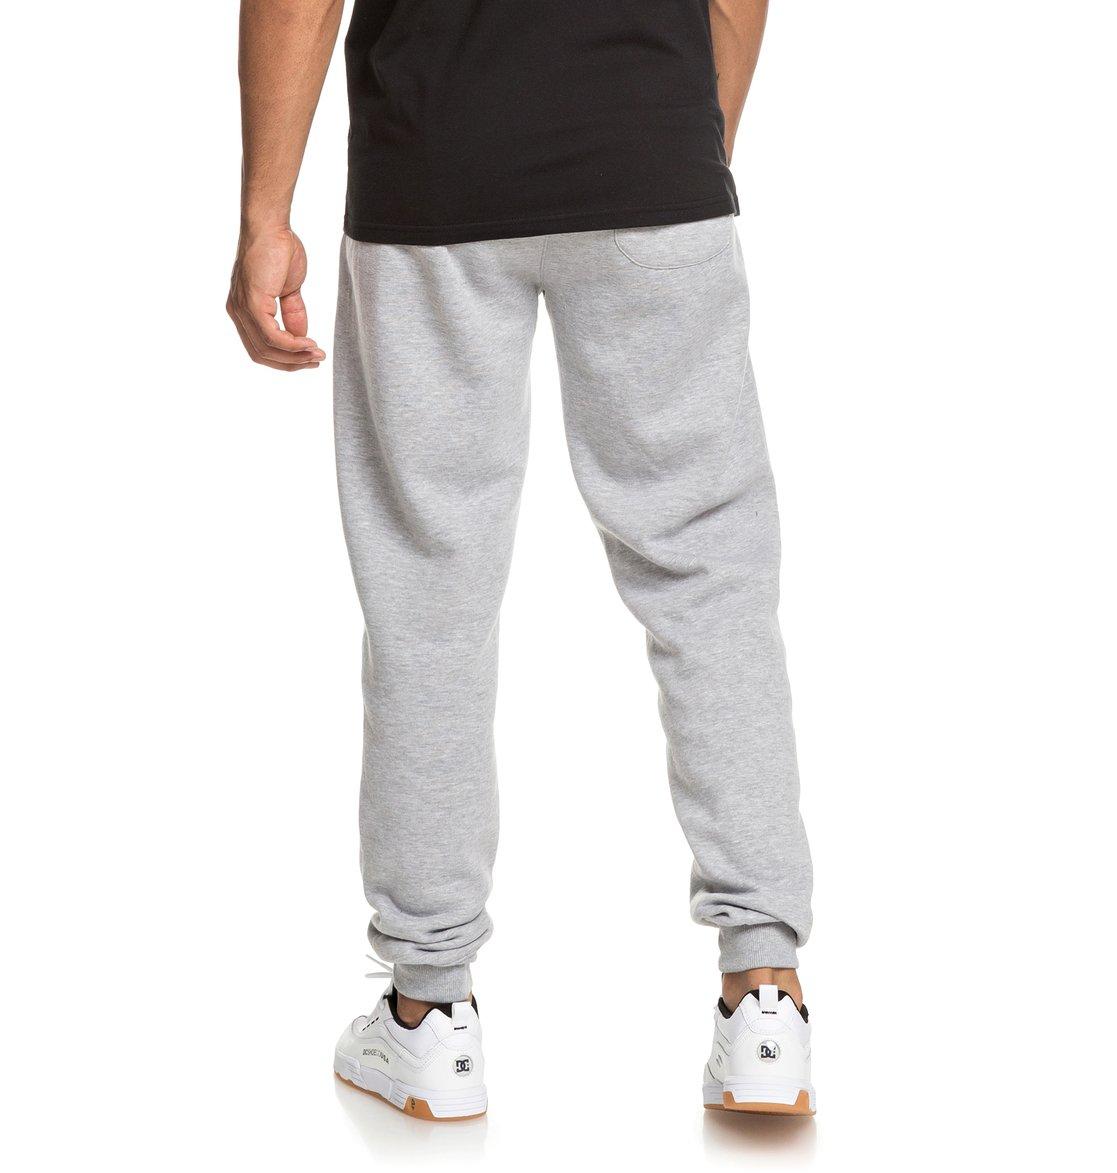 97abbd0334c0 6 Rebel Joggers Black EDYFB03055 DC Shoes